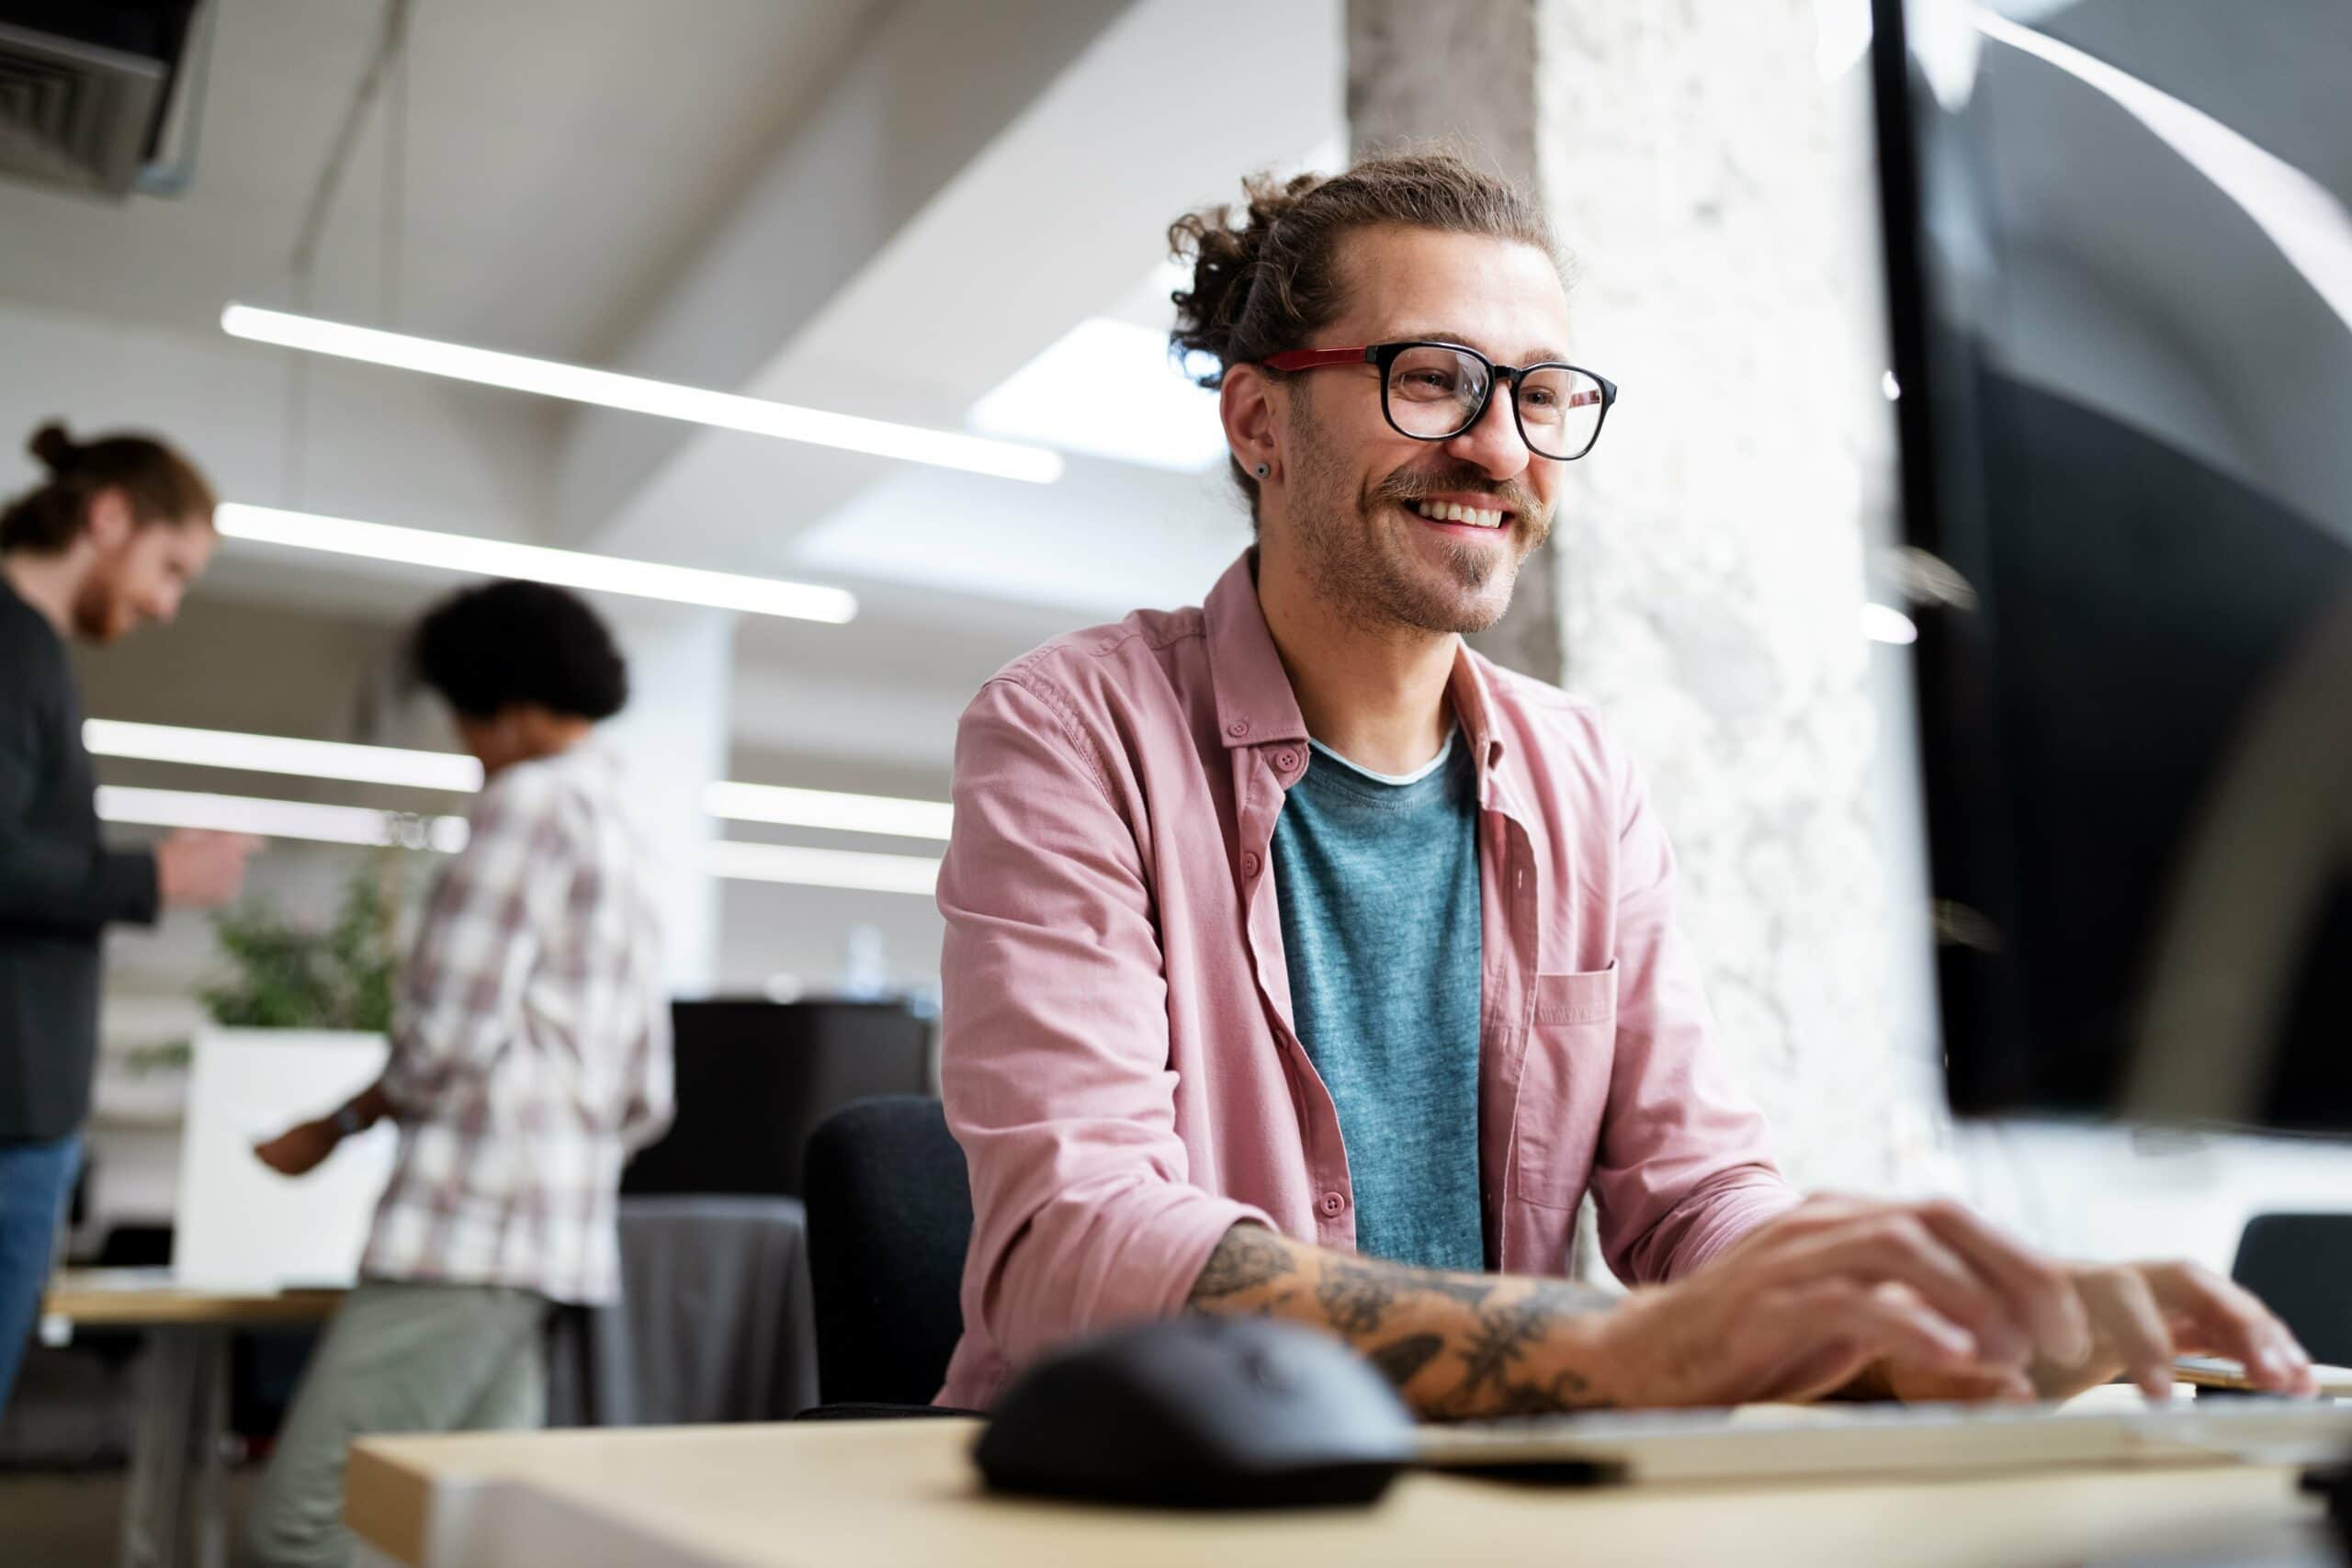 Will EverLogic Or CDK Help Your RV Dealership Grow?